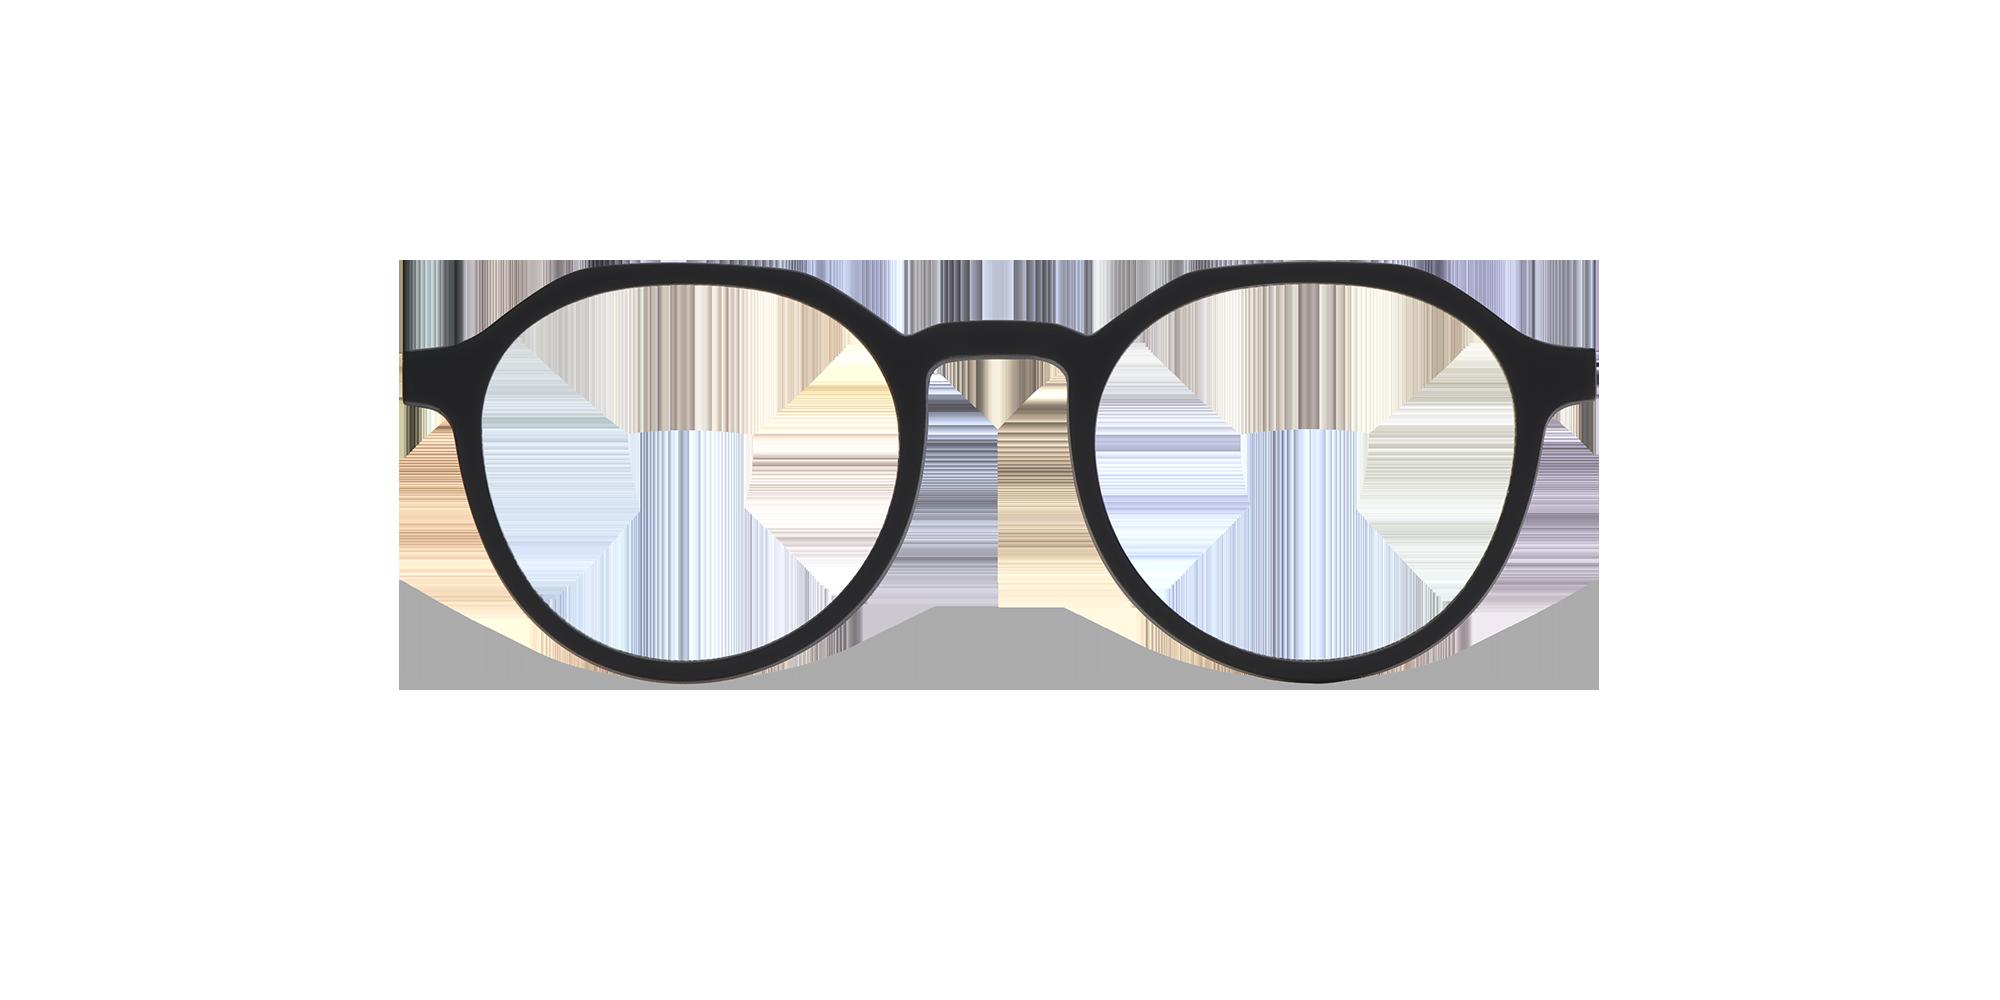 afflelou/france/products/smart_clip/clips_glasses/07630036428986_face.png